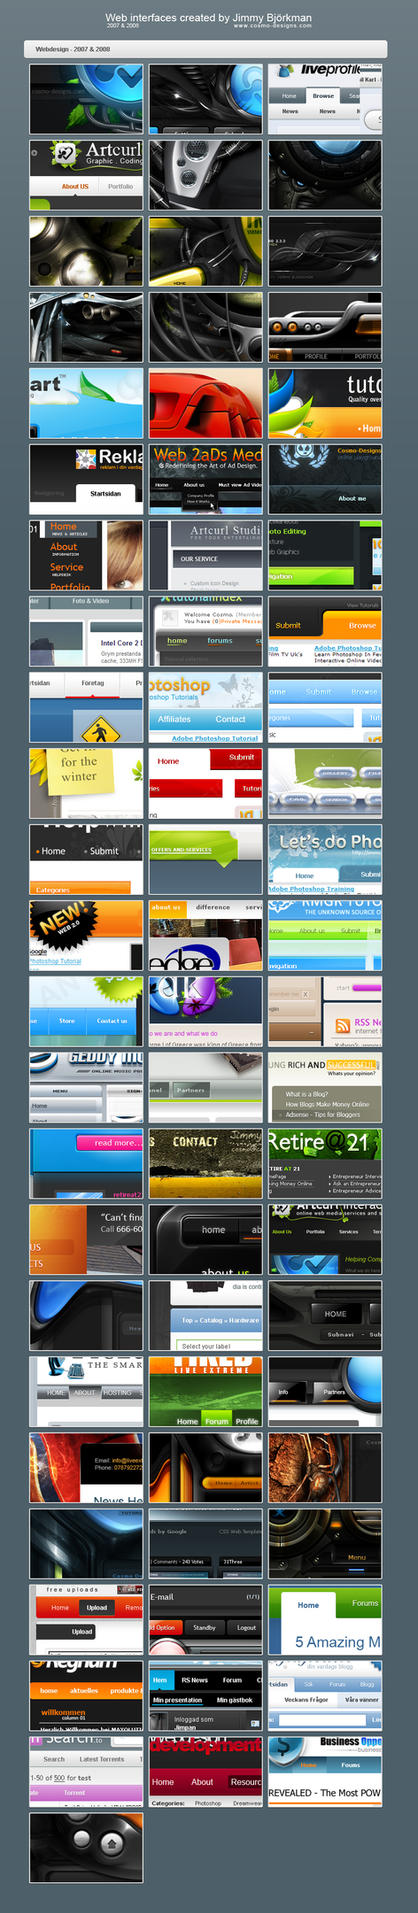 Web interface Collection 07-08 by jimmybjorkman